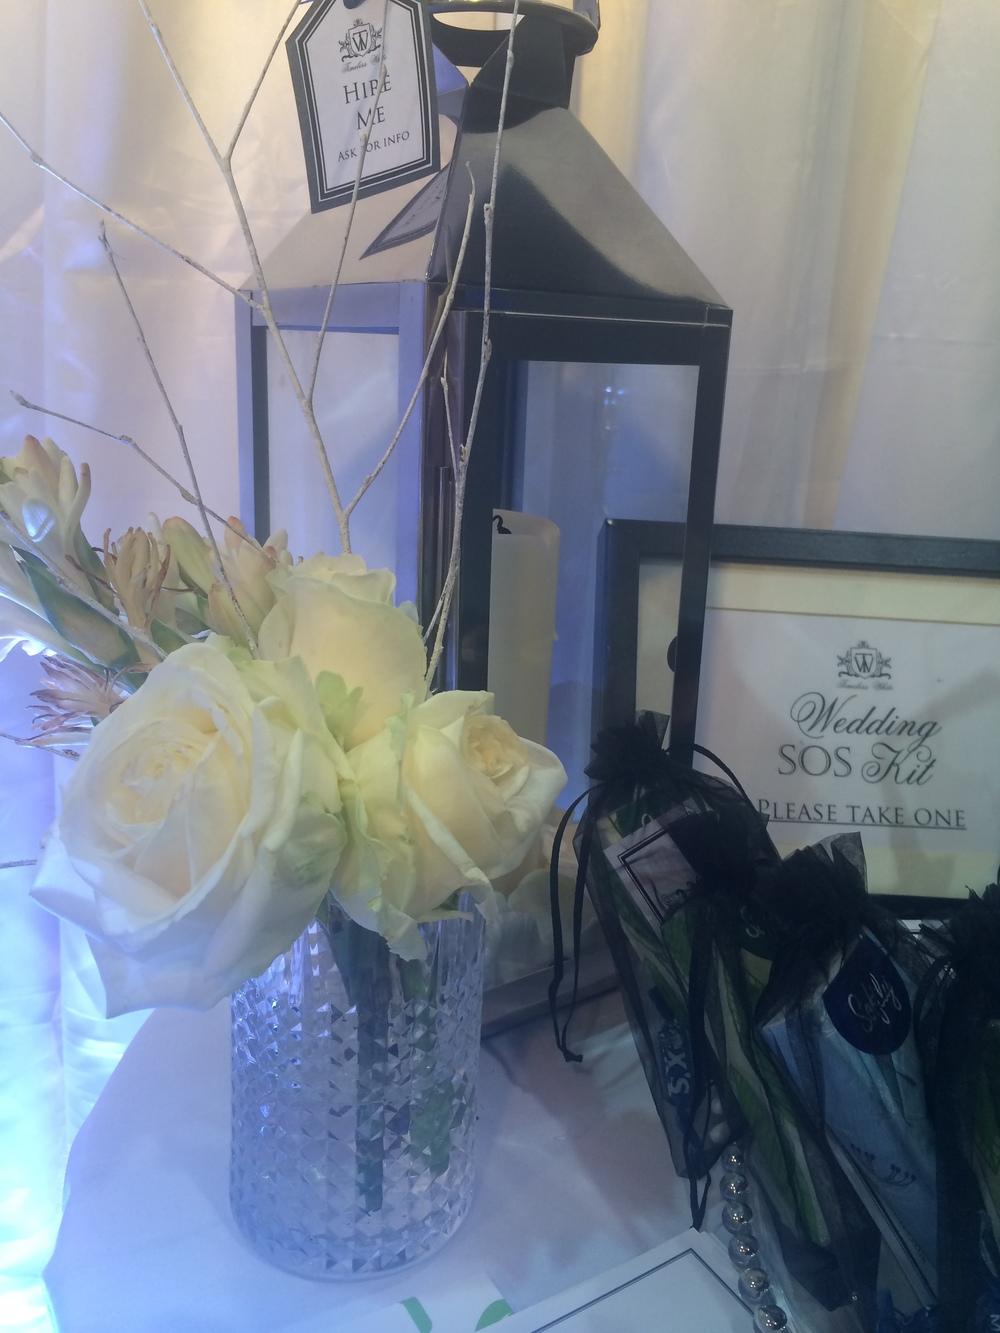 Wedding SOS Emergency Kit